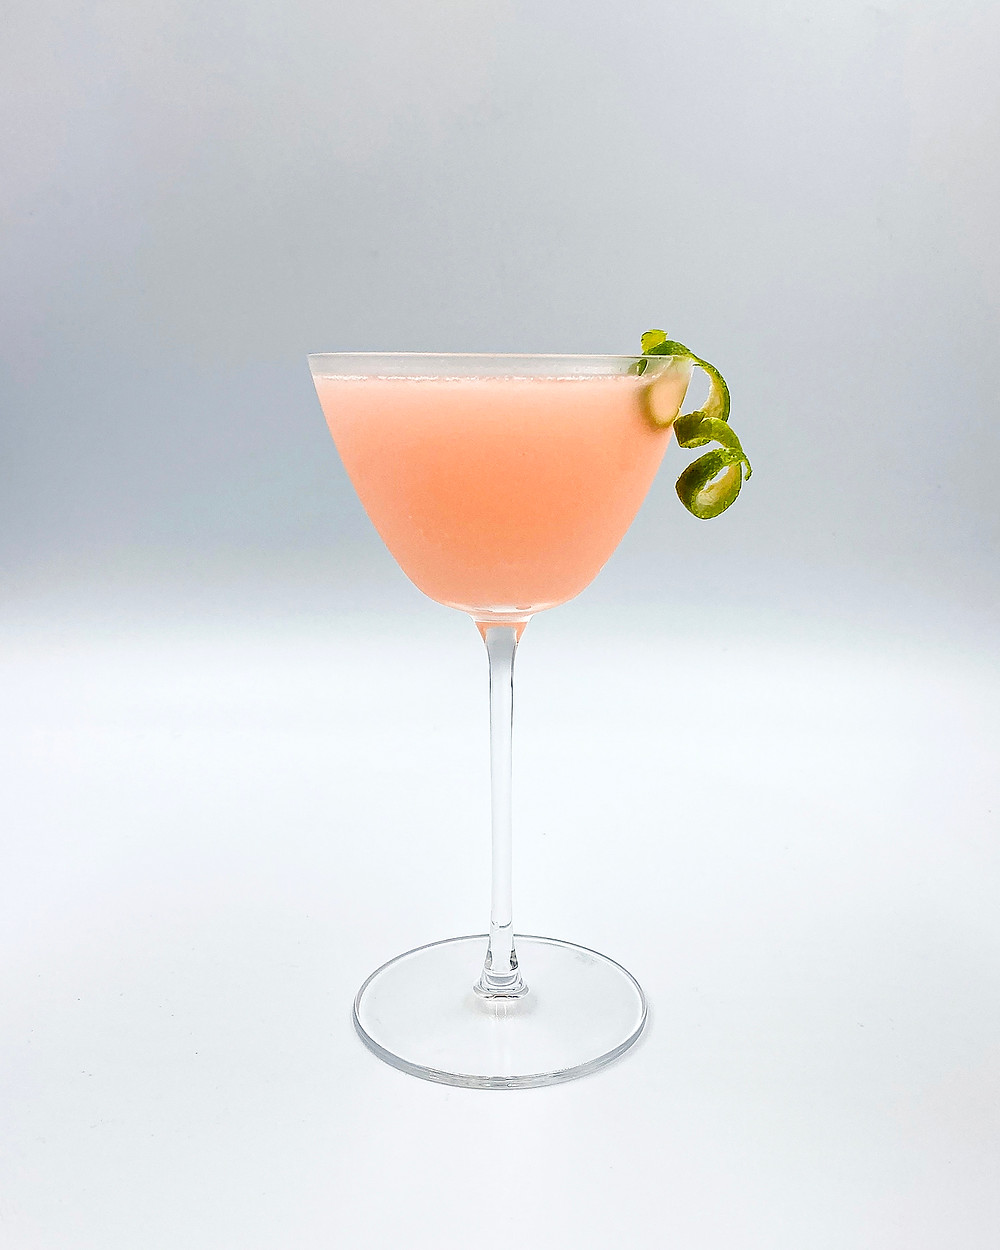 Gin Professors Rhubarb Gimlet